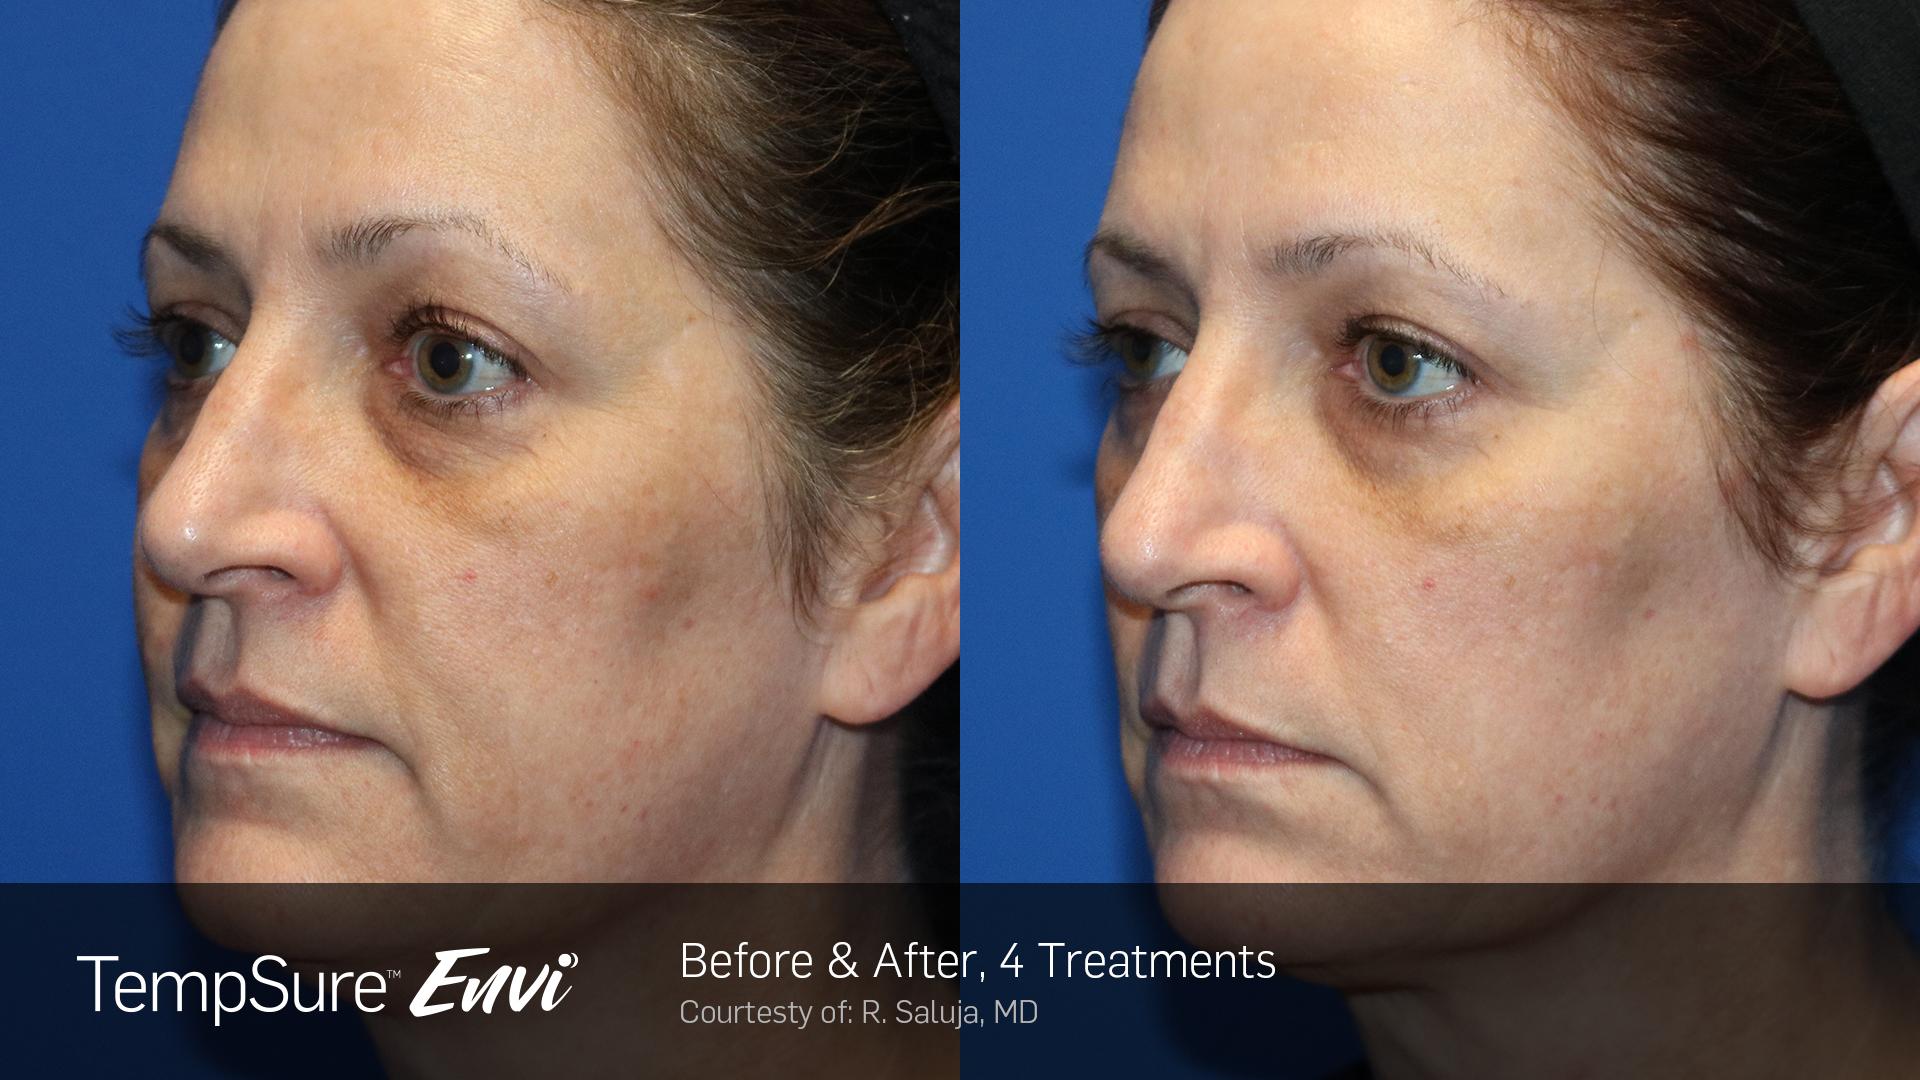 TempSure Skin Tightening and collagen stimulation in face